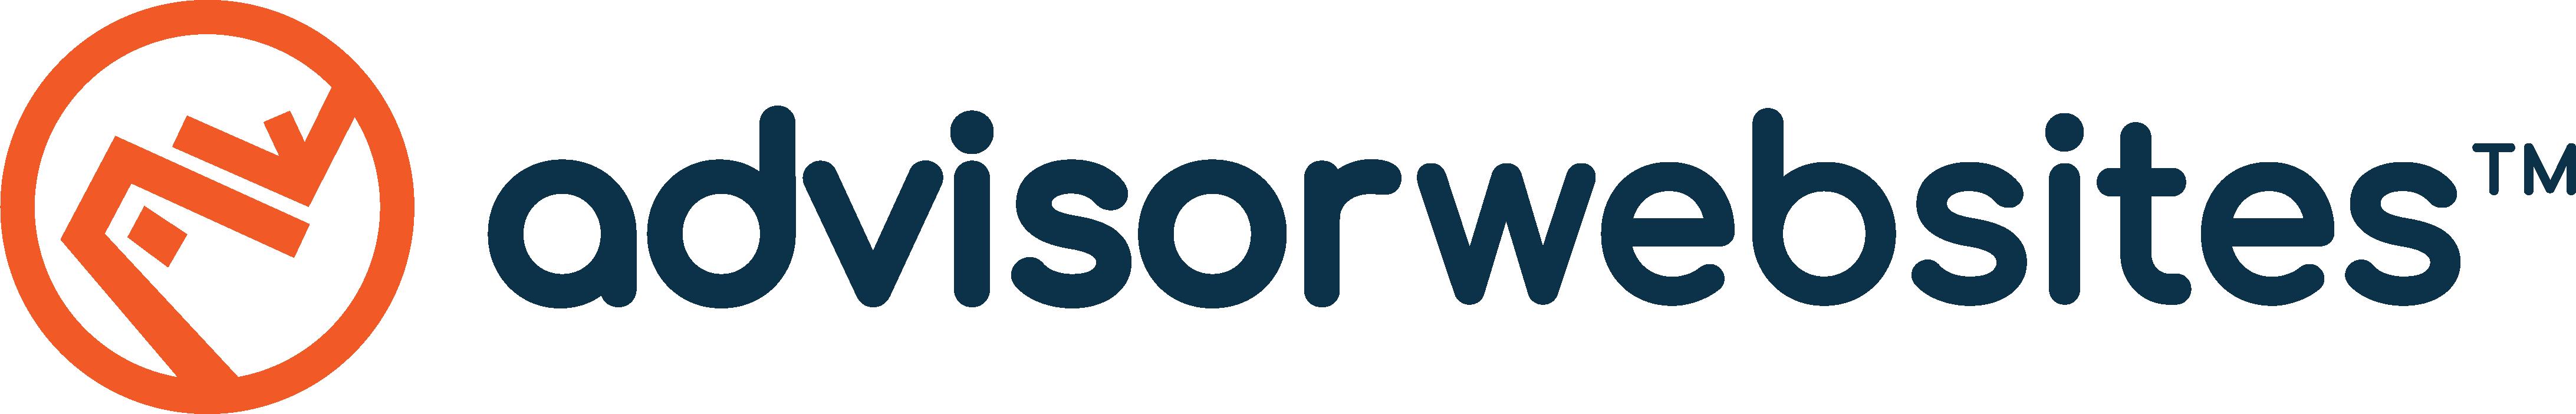 logo-tm-bicolor-landscape